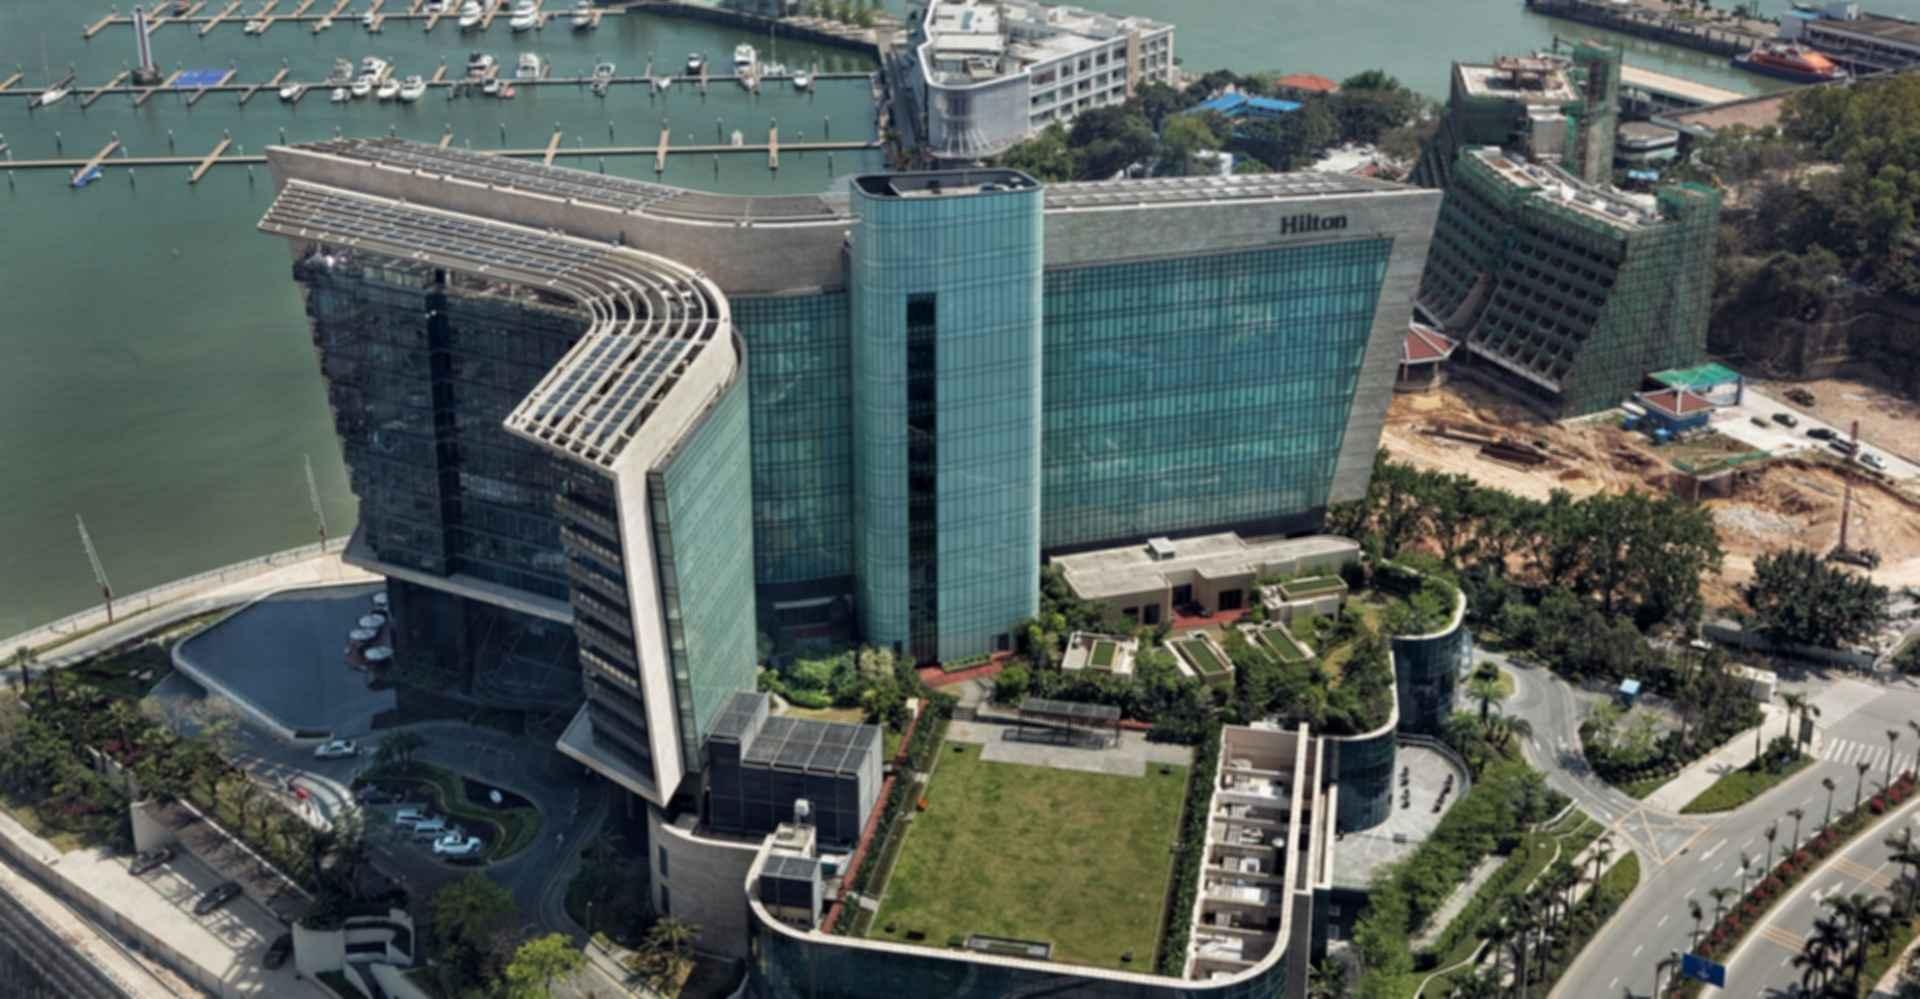 Hilton Shenzhen Marina Hotel - Bird's Eye View